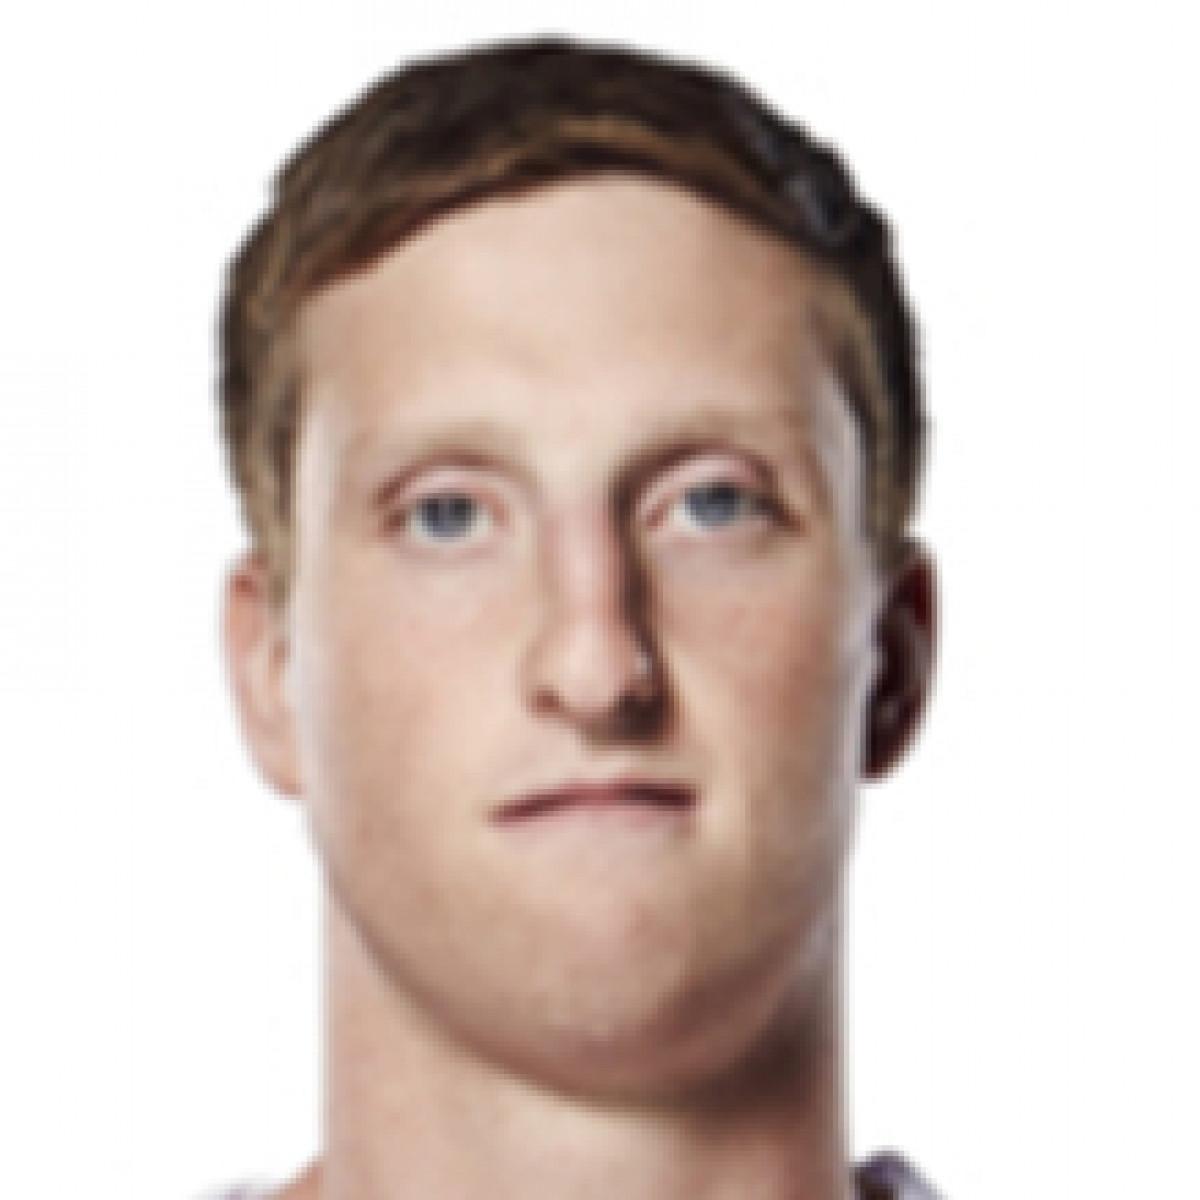 Matt Klinewski